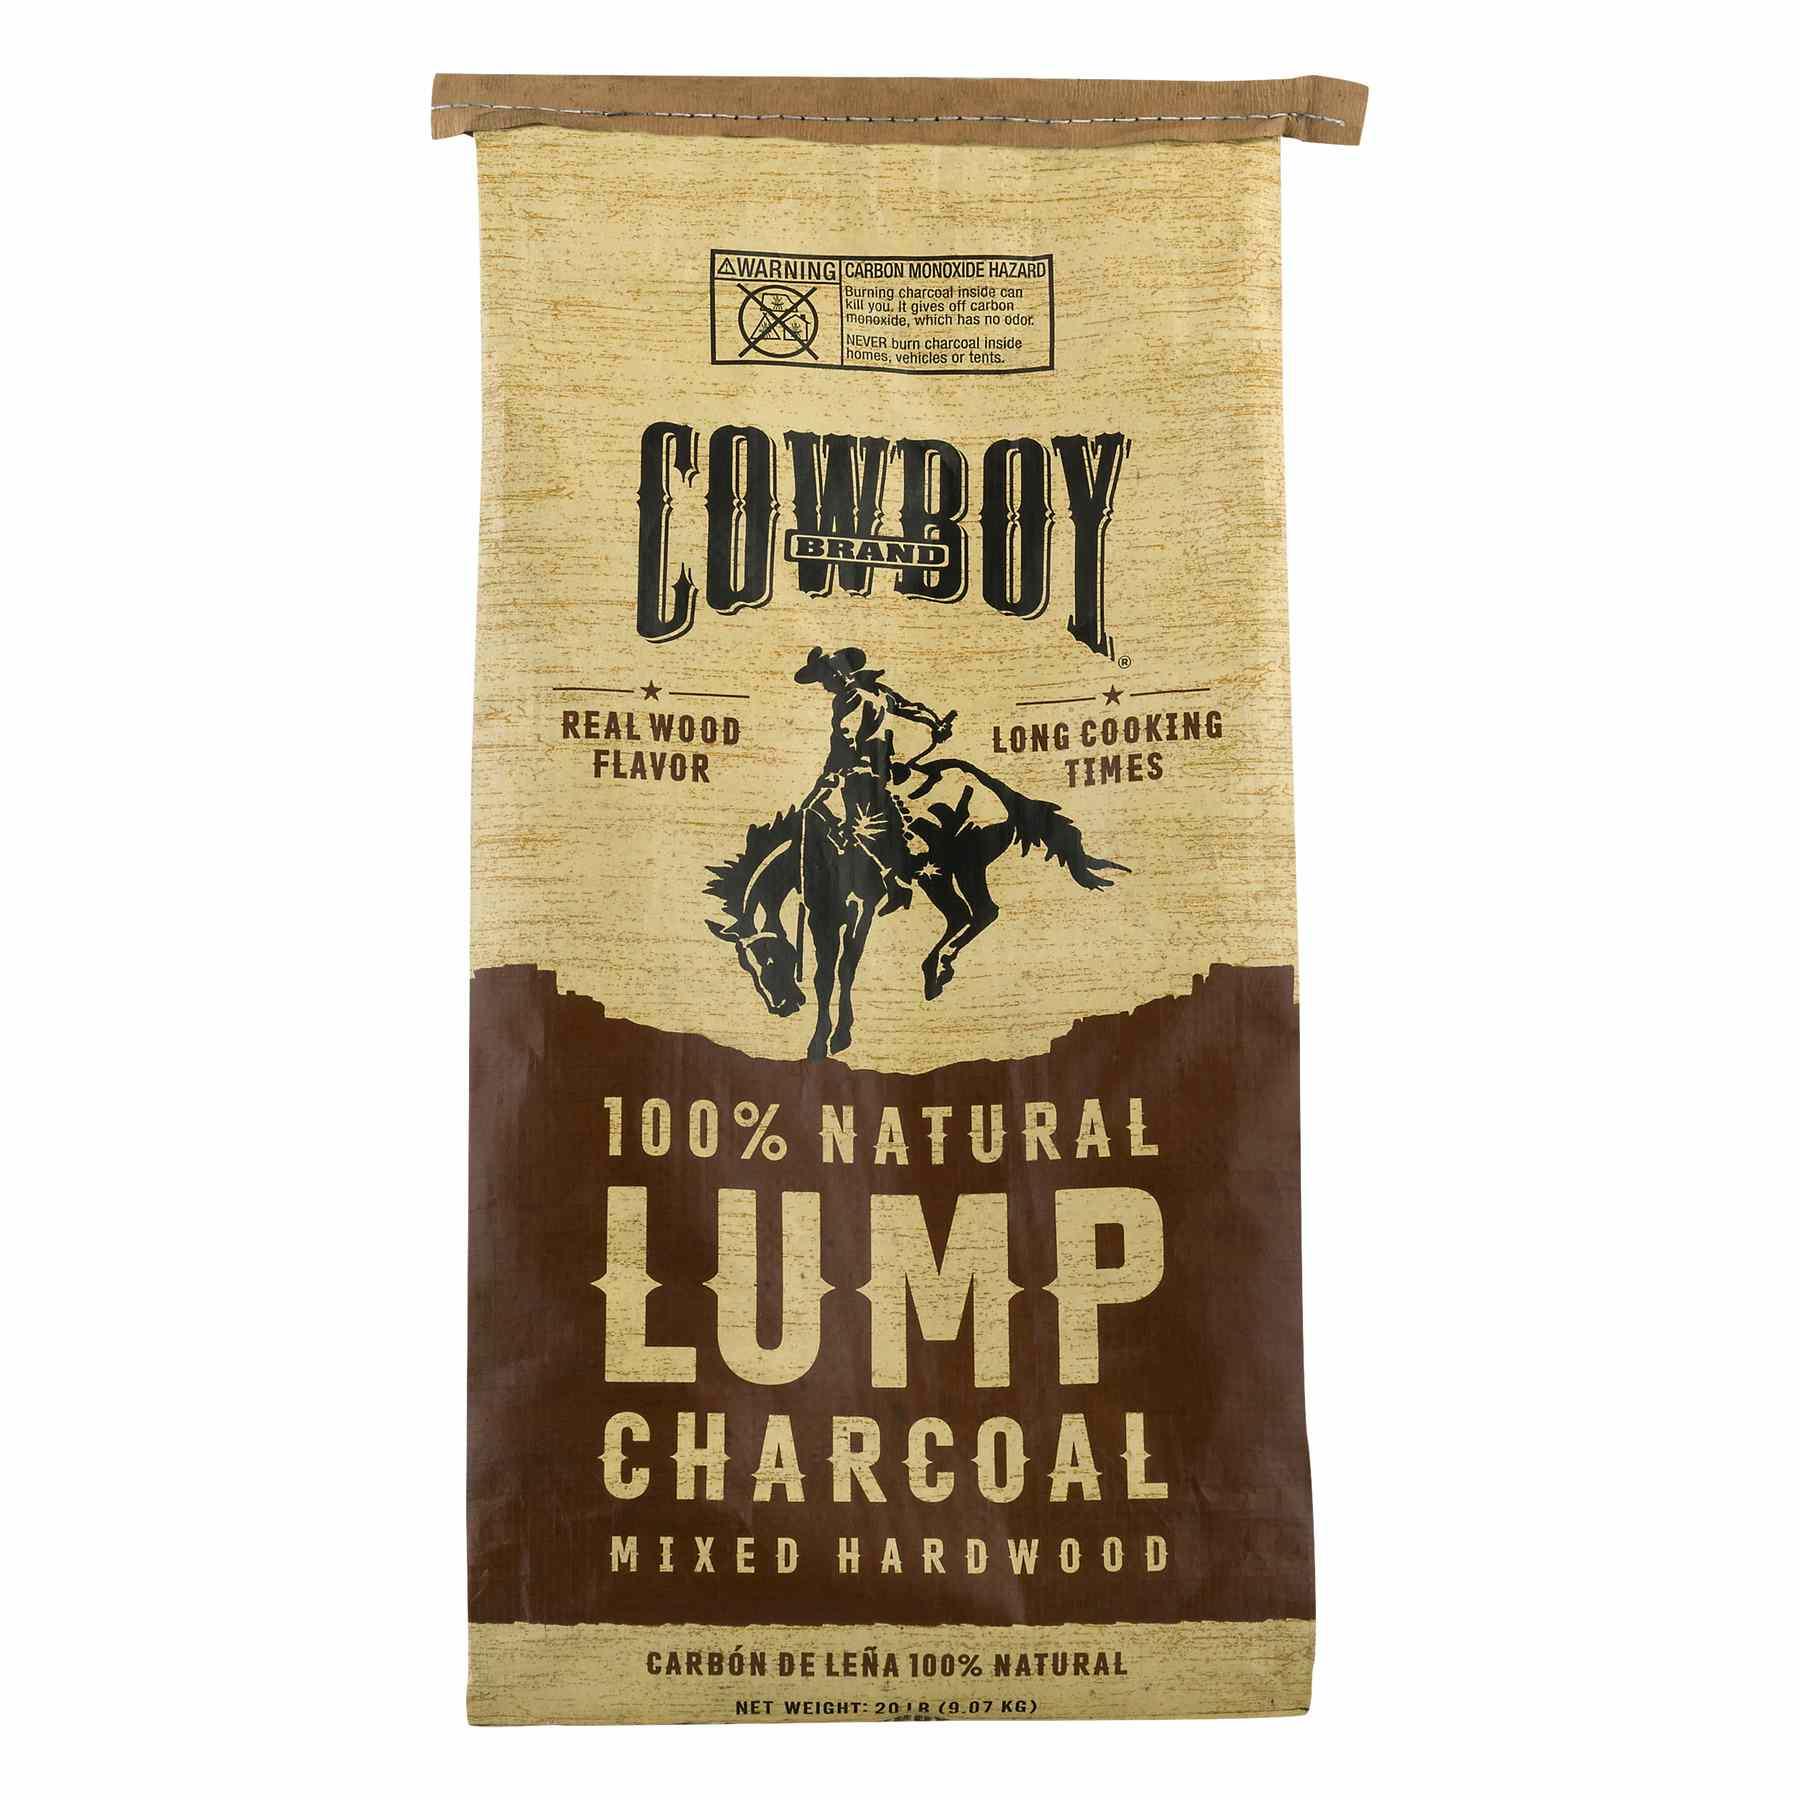 All Natural Hardwood Lump Charcoal